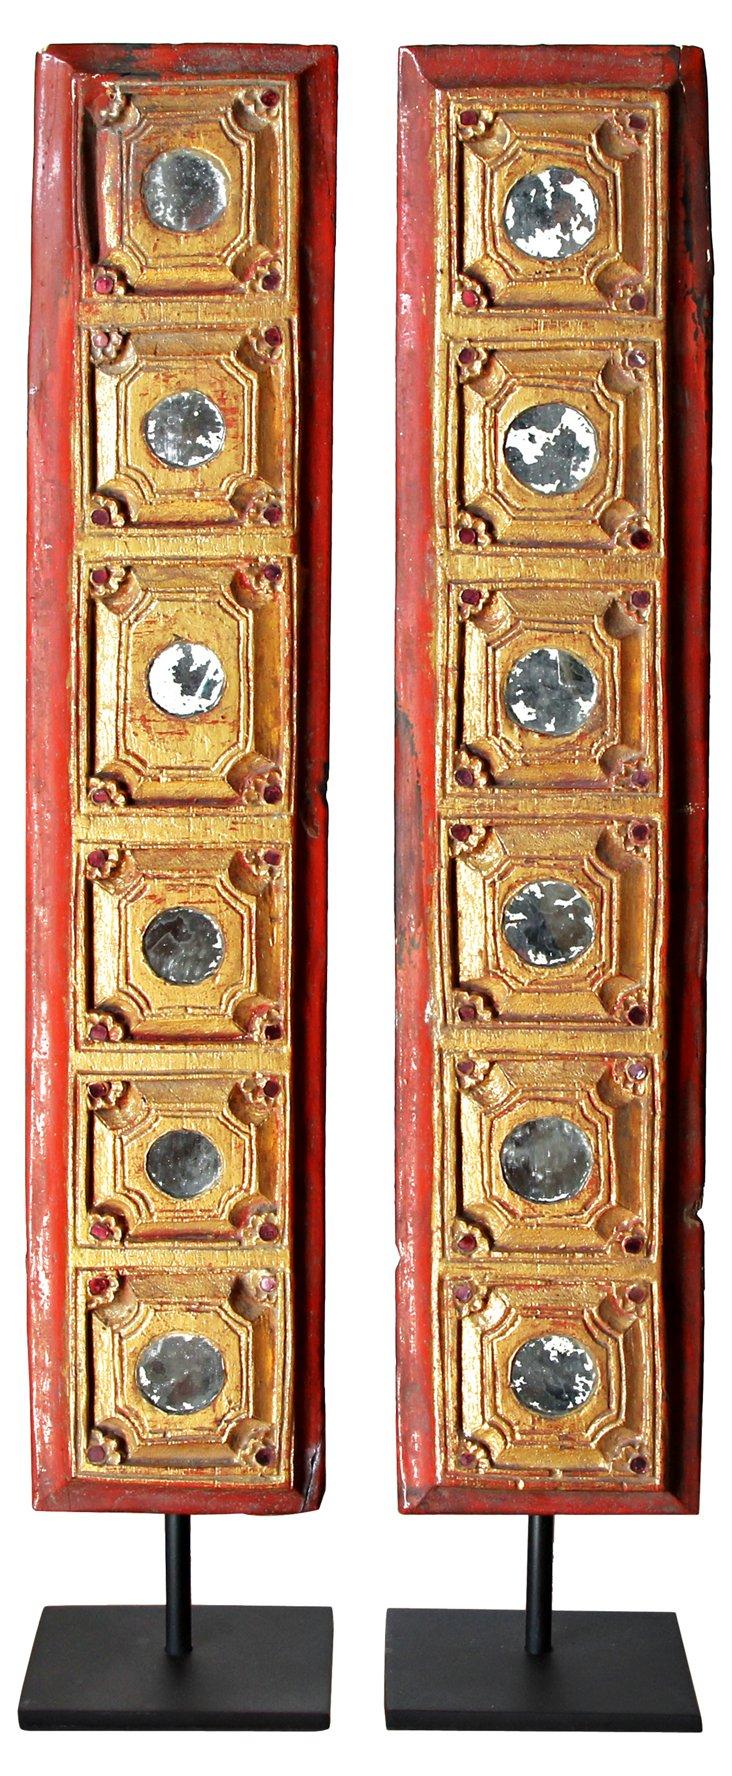 Antique Burmese Book Covers, Pair